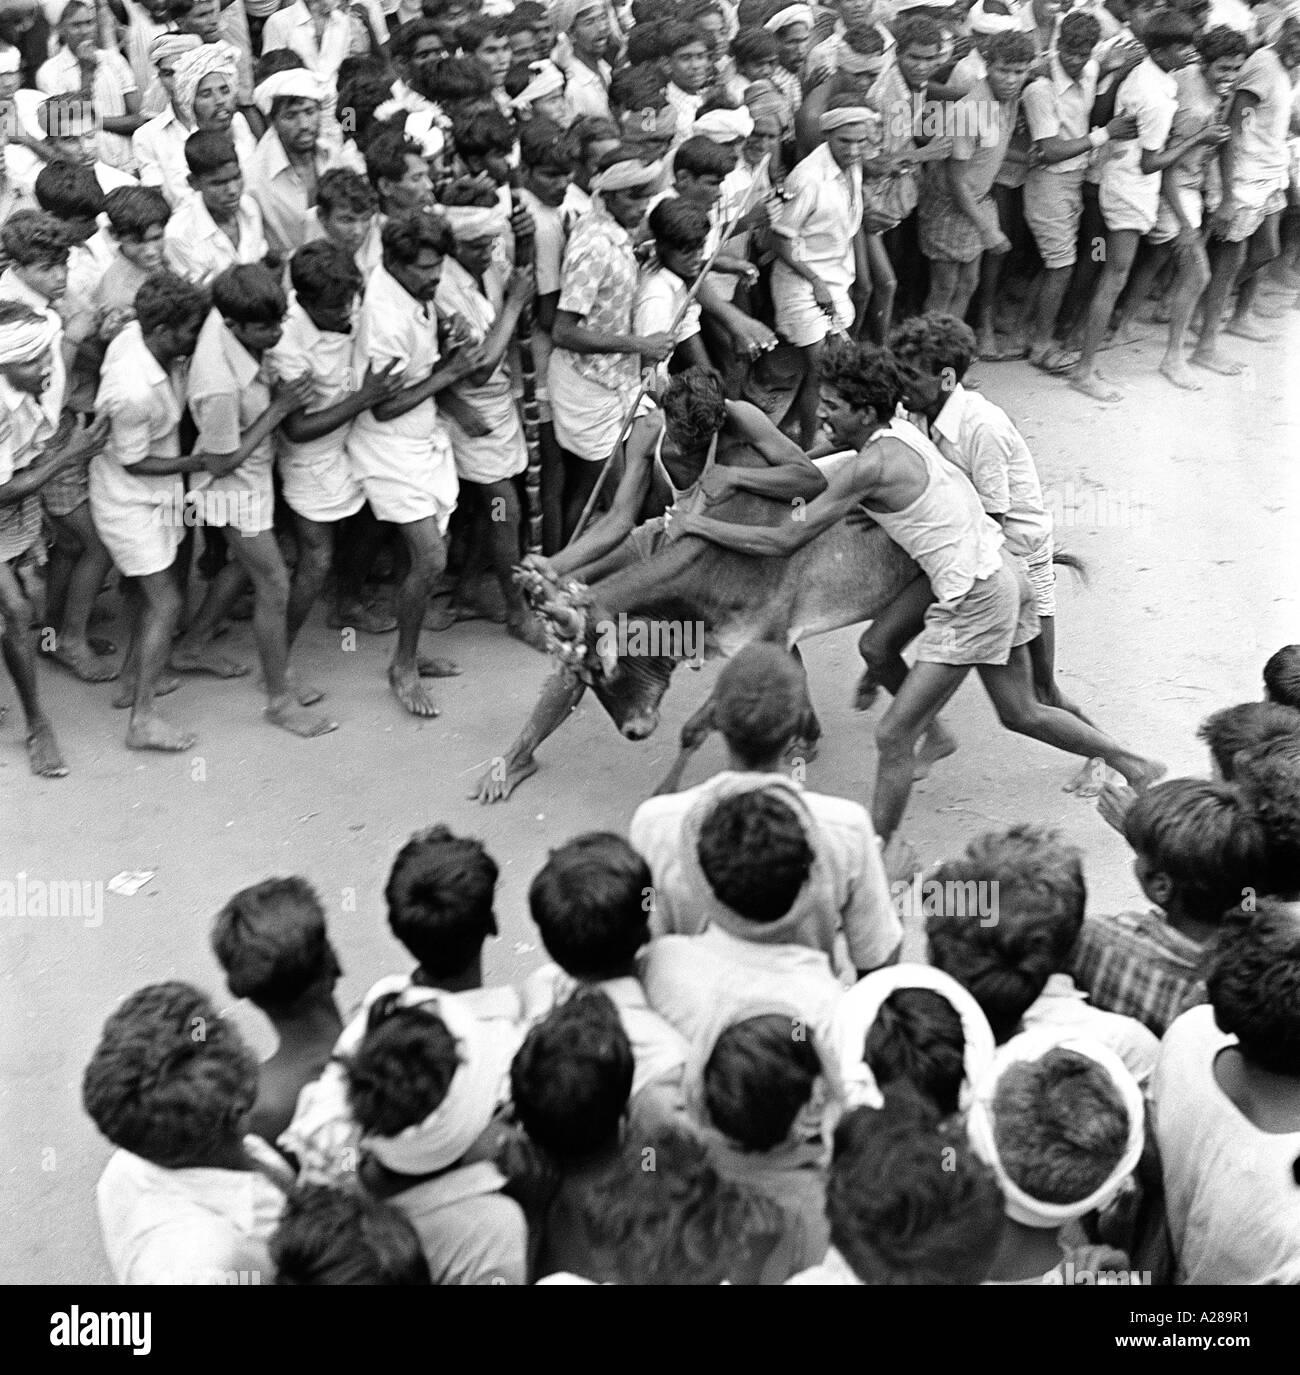 MAA76643 Jallikattu Bull Taming Madurai Tamilnadu India - Stock Image